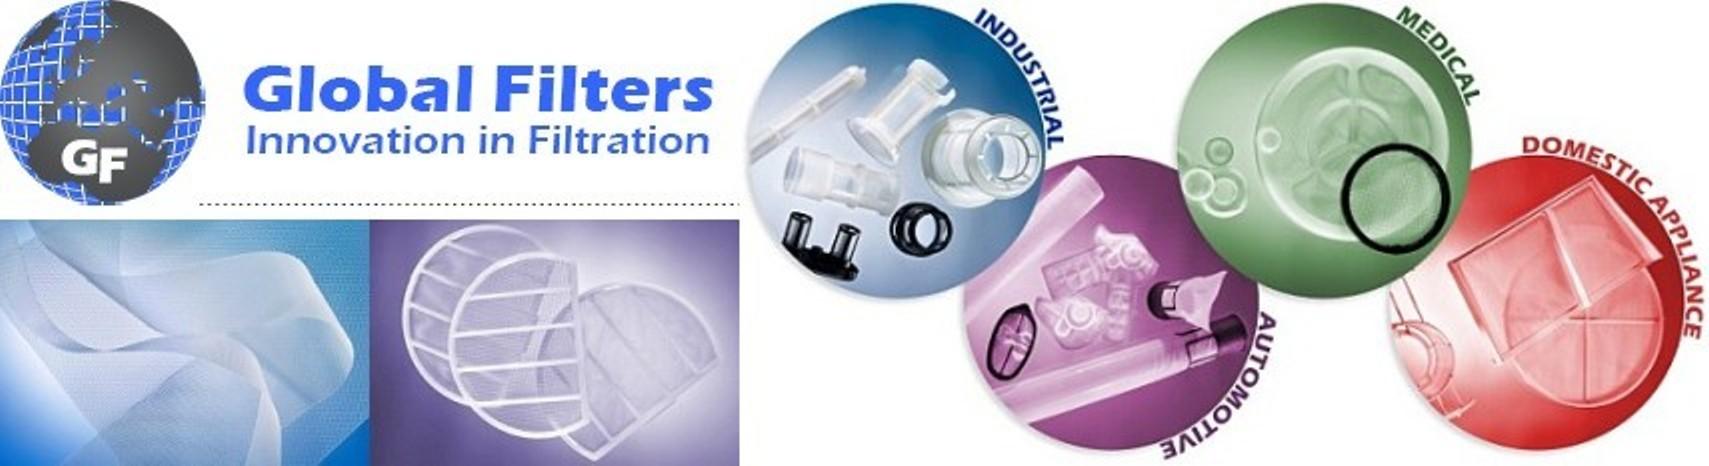 Global Filters Ltd (GFL) – Innovation in Filtration